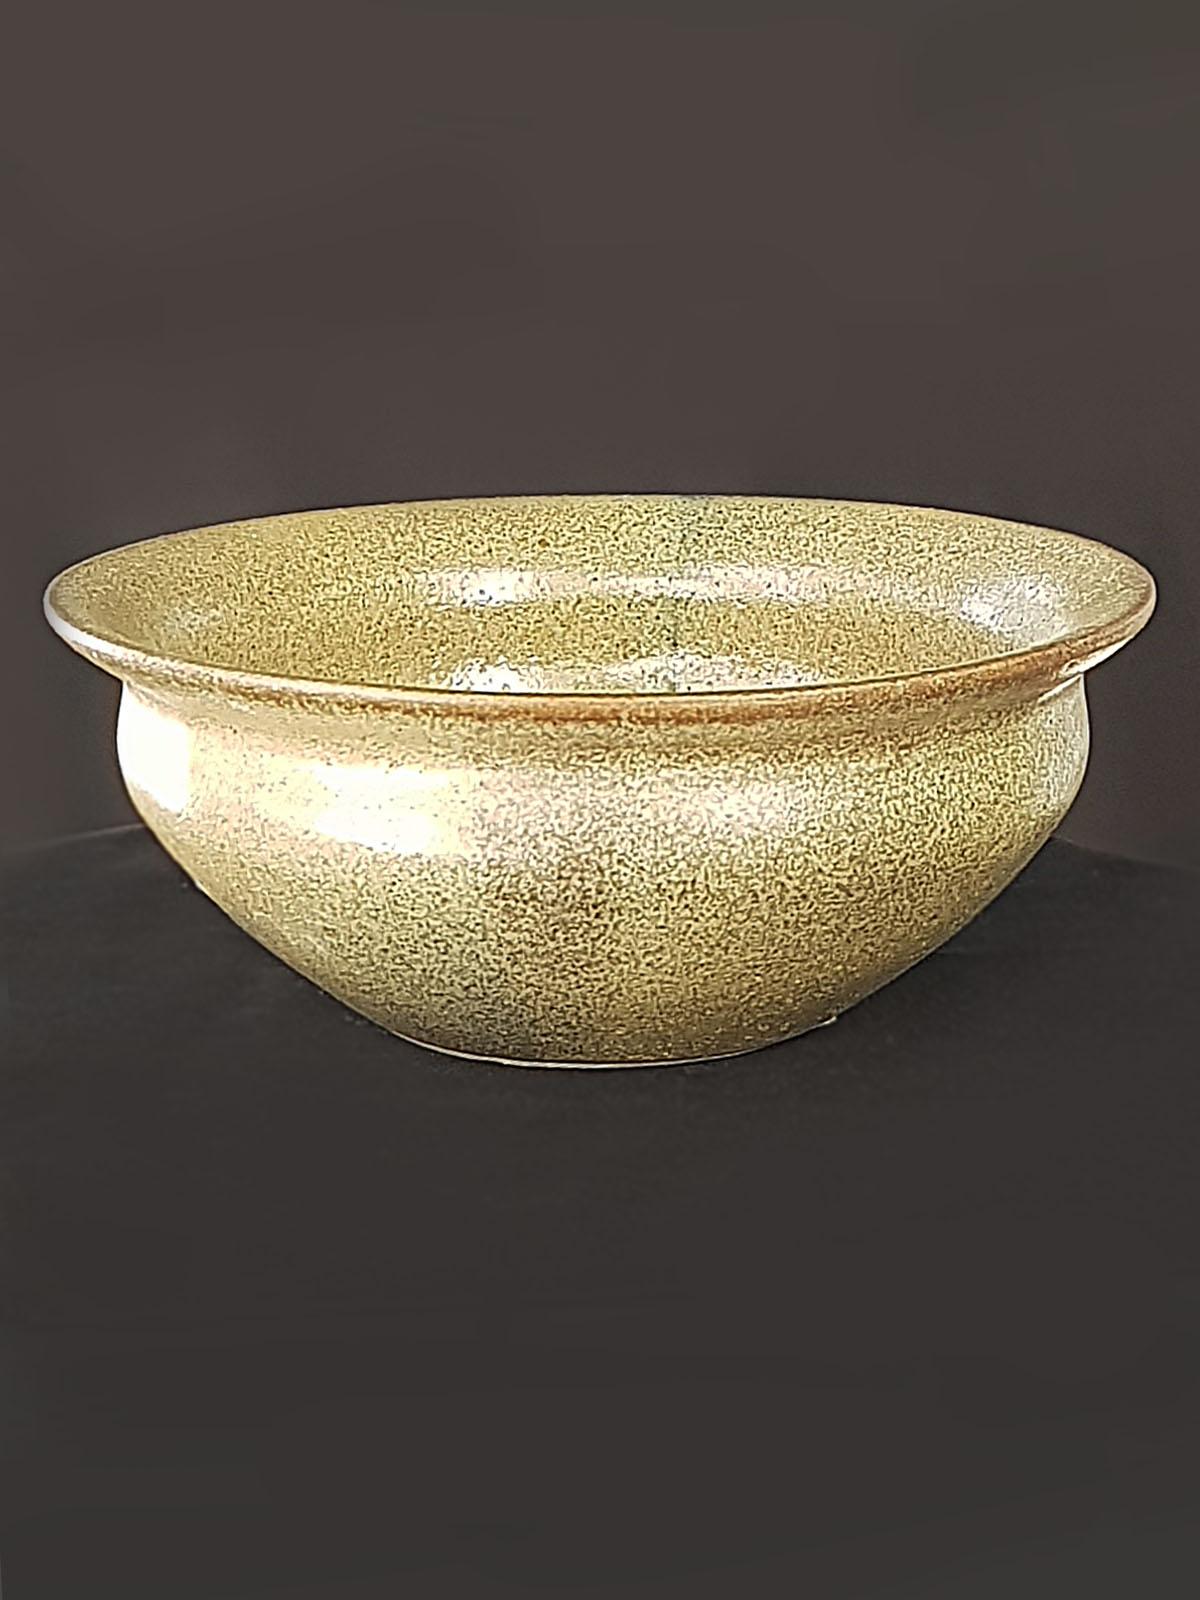 bowl102-x